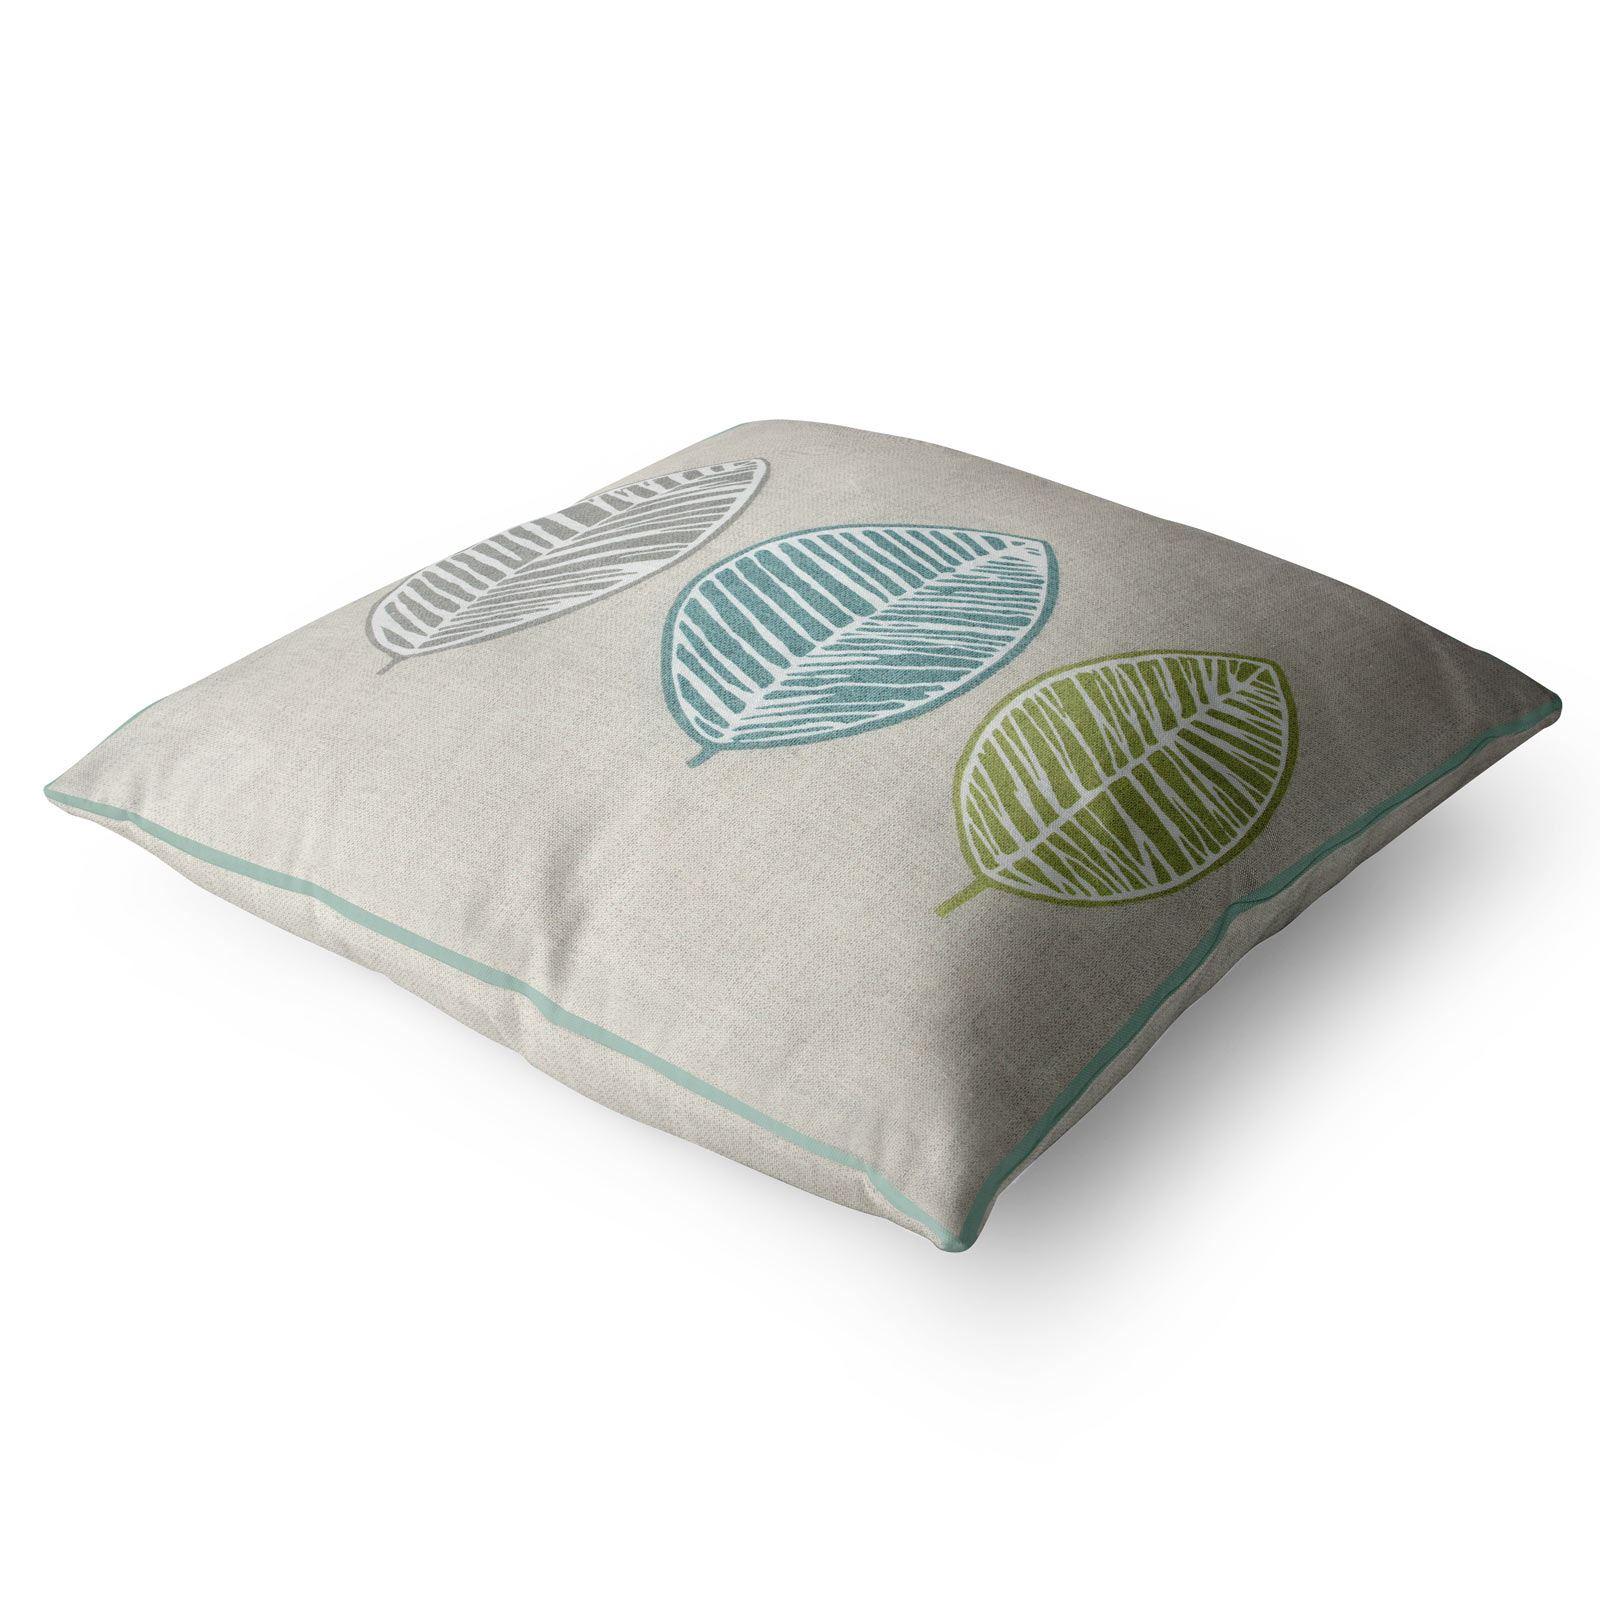 Teal-Blue-Duck-Egg-Cushion-Covers-18-034-x18-034-45cm-x-45cm-Luxury-Cover thumbnail 46